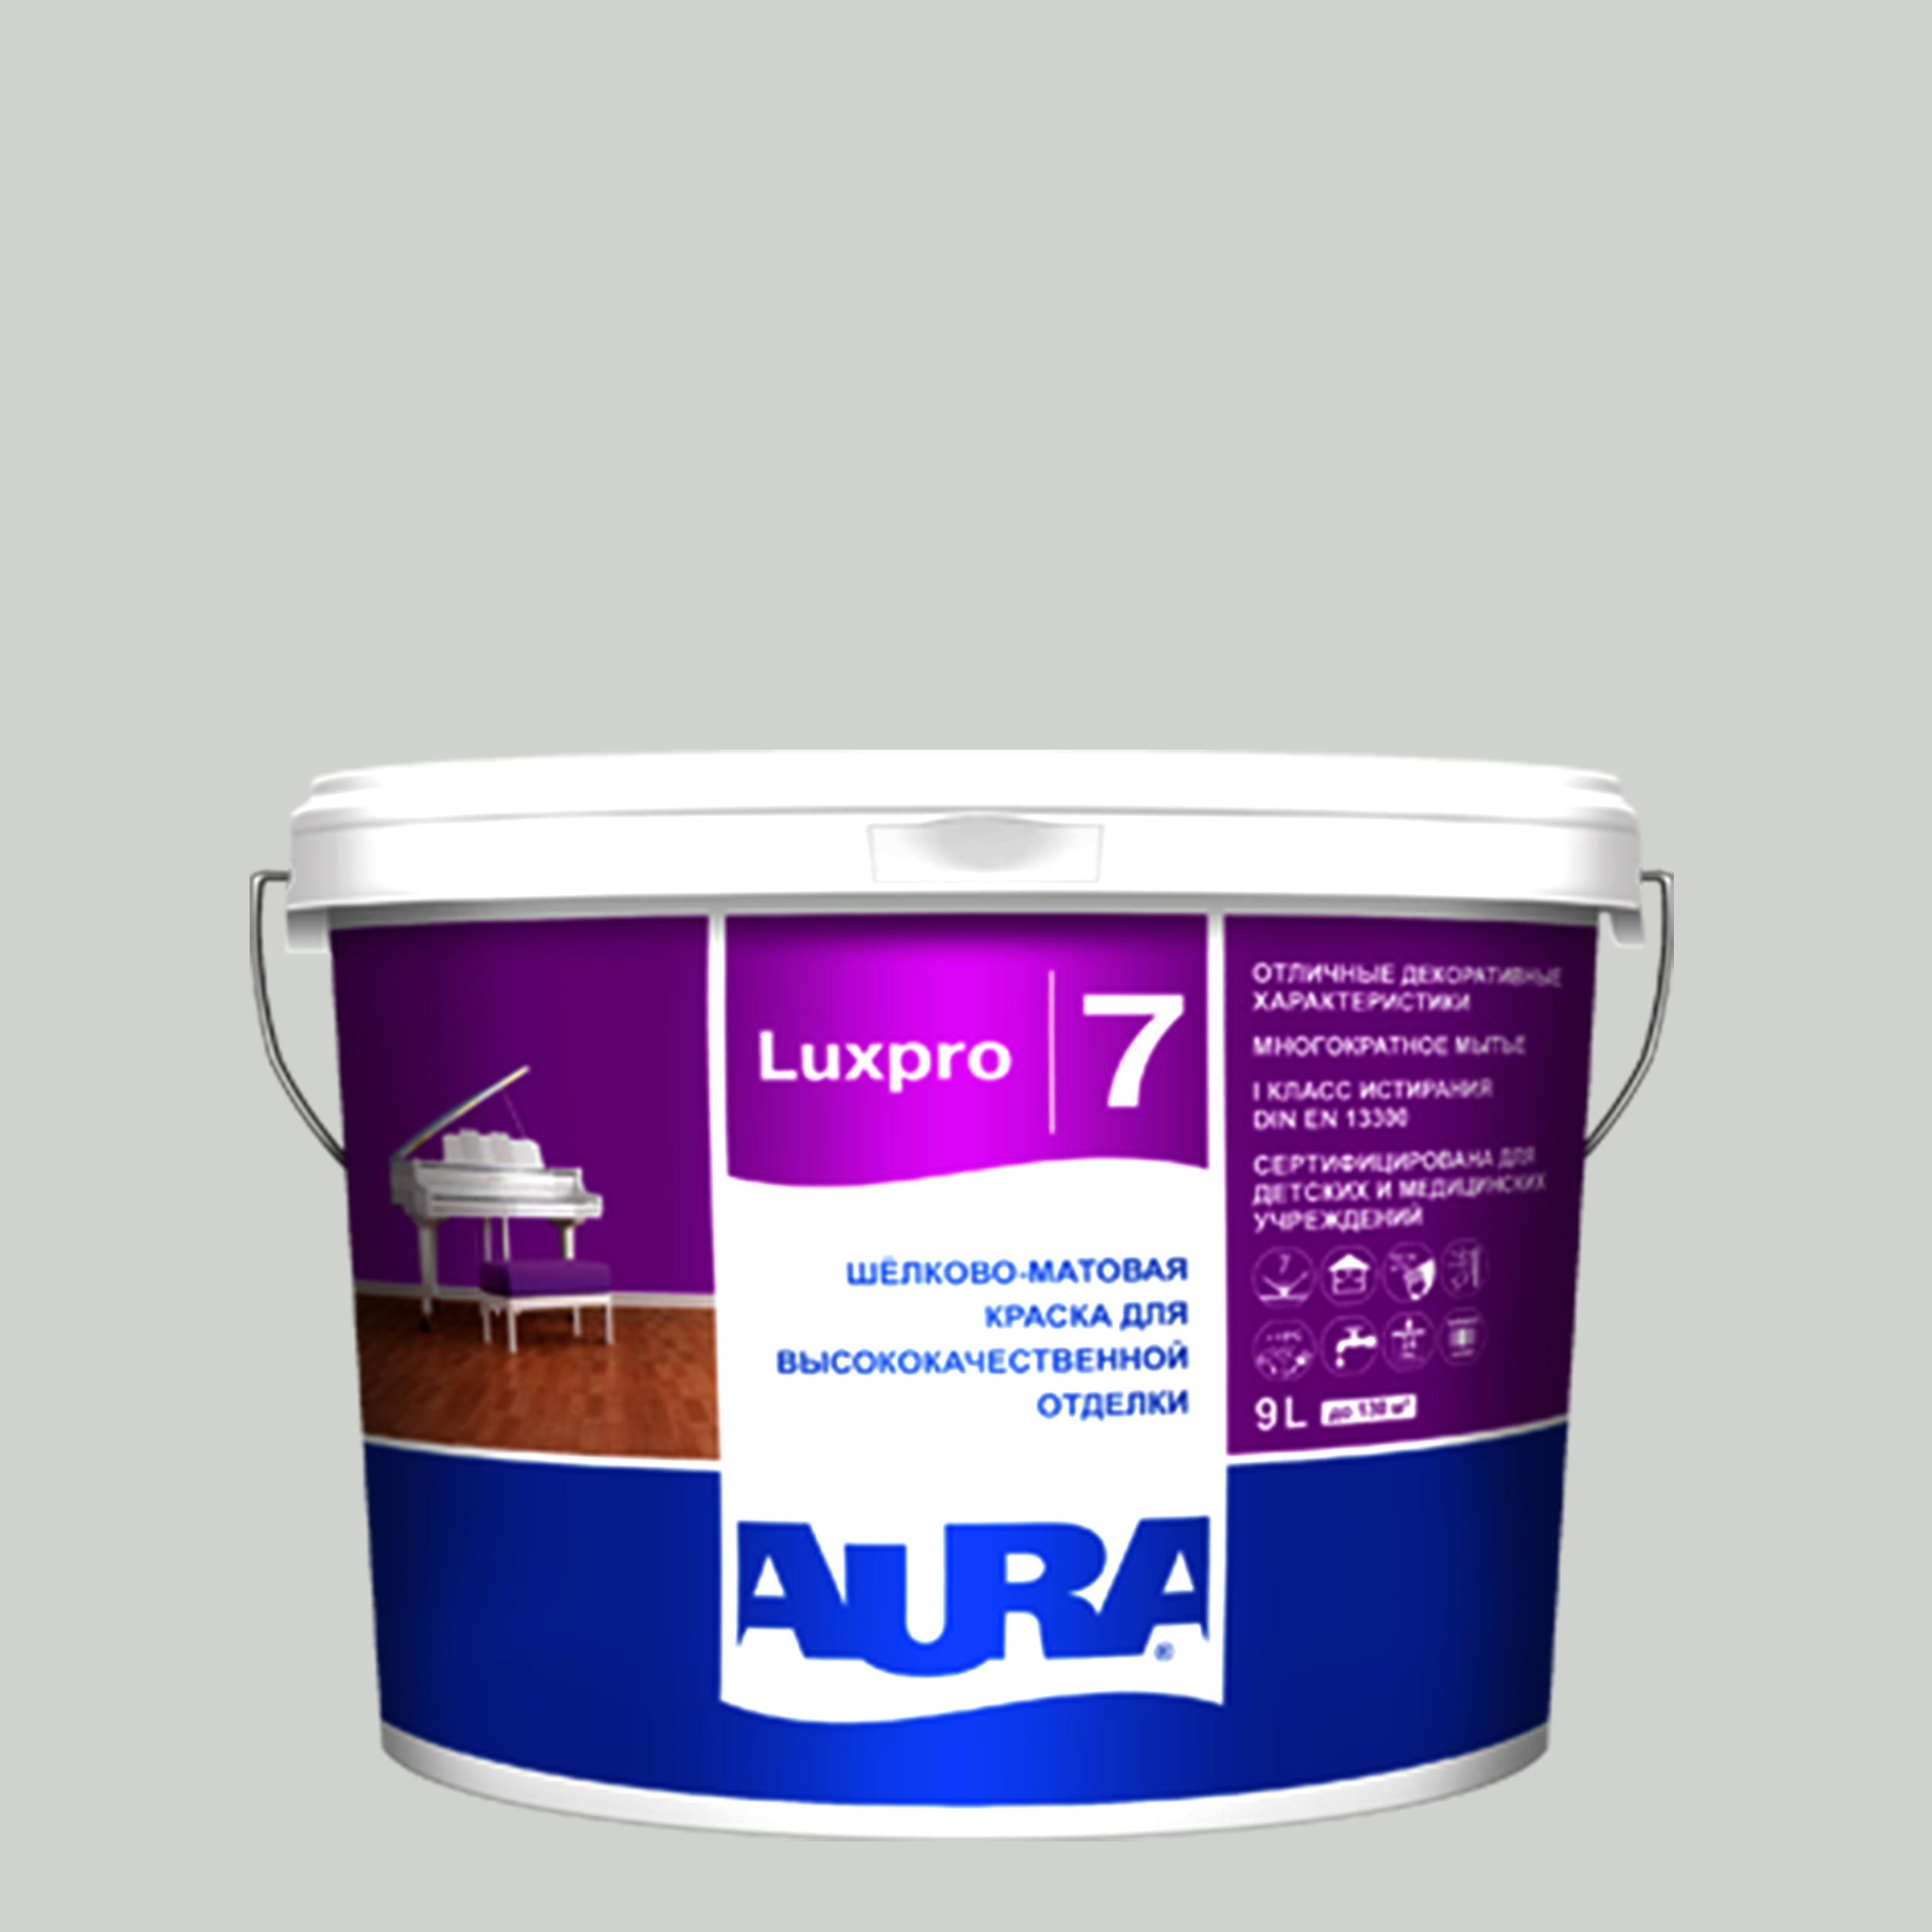 Фото 5 - Краска интерьерная, Aura LuxPRO 7, RAL 7037, 11 кг.